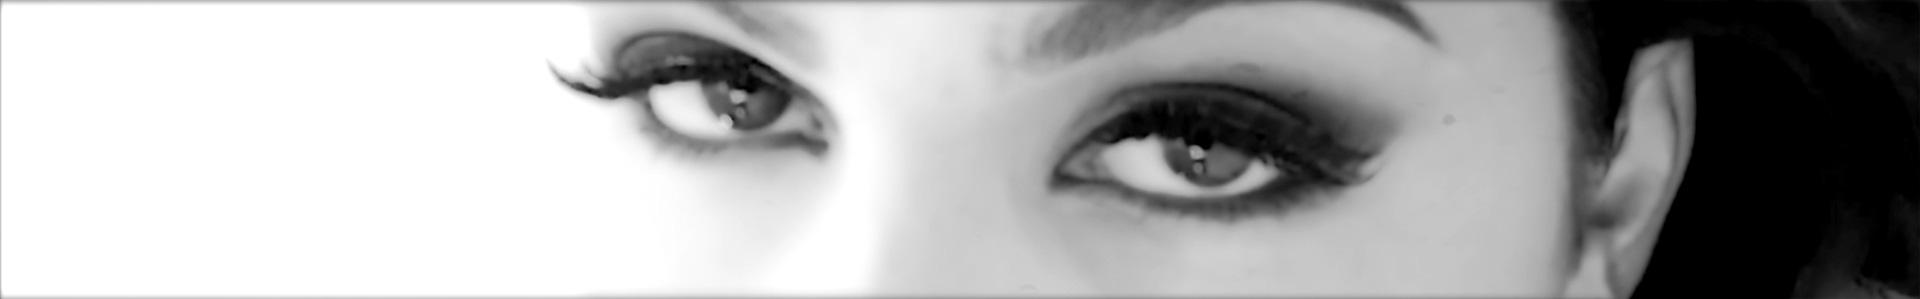 Çıplak Göz / Özlem Mengilibörü